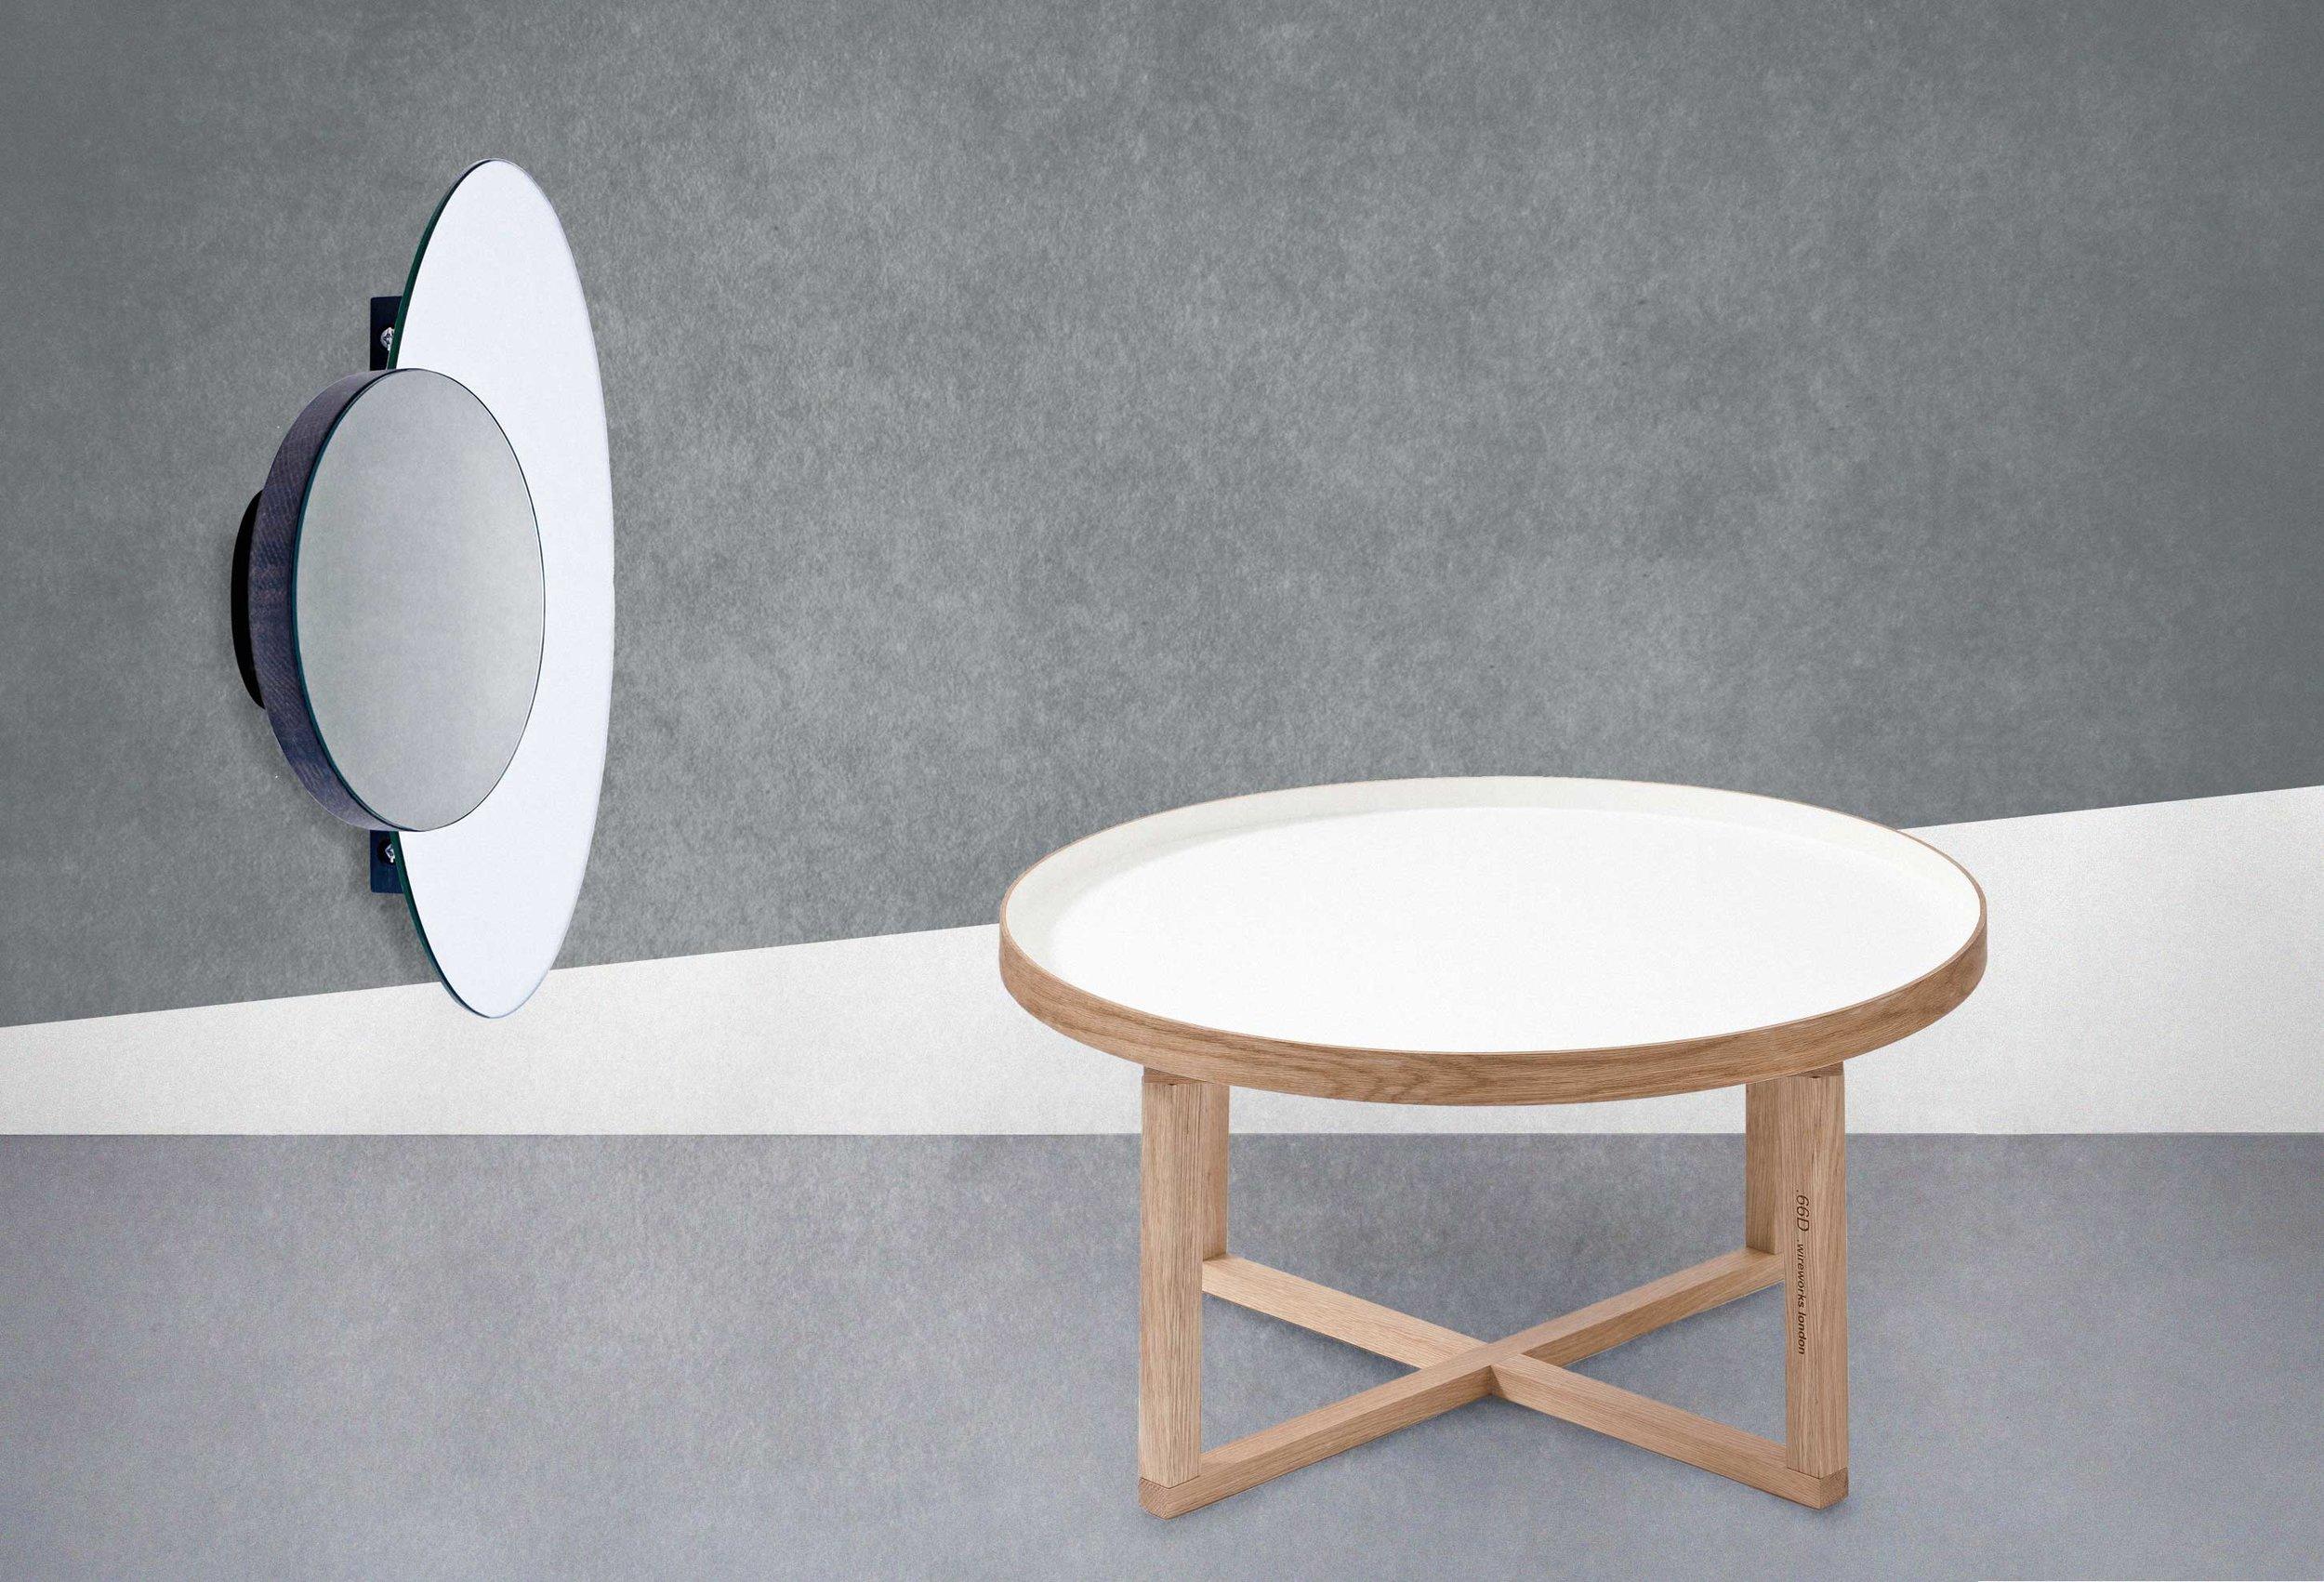 _wireworks_LE_MILE_Magazine_LE_MILE_SeLECTED_European_Furniture_Design_2018_1.jpg